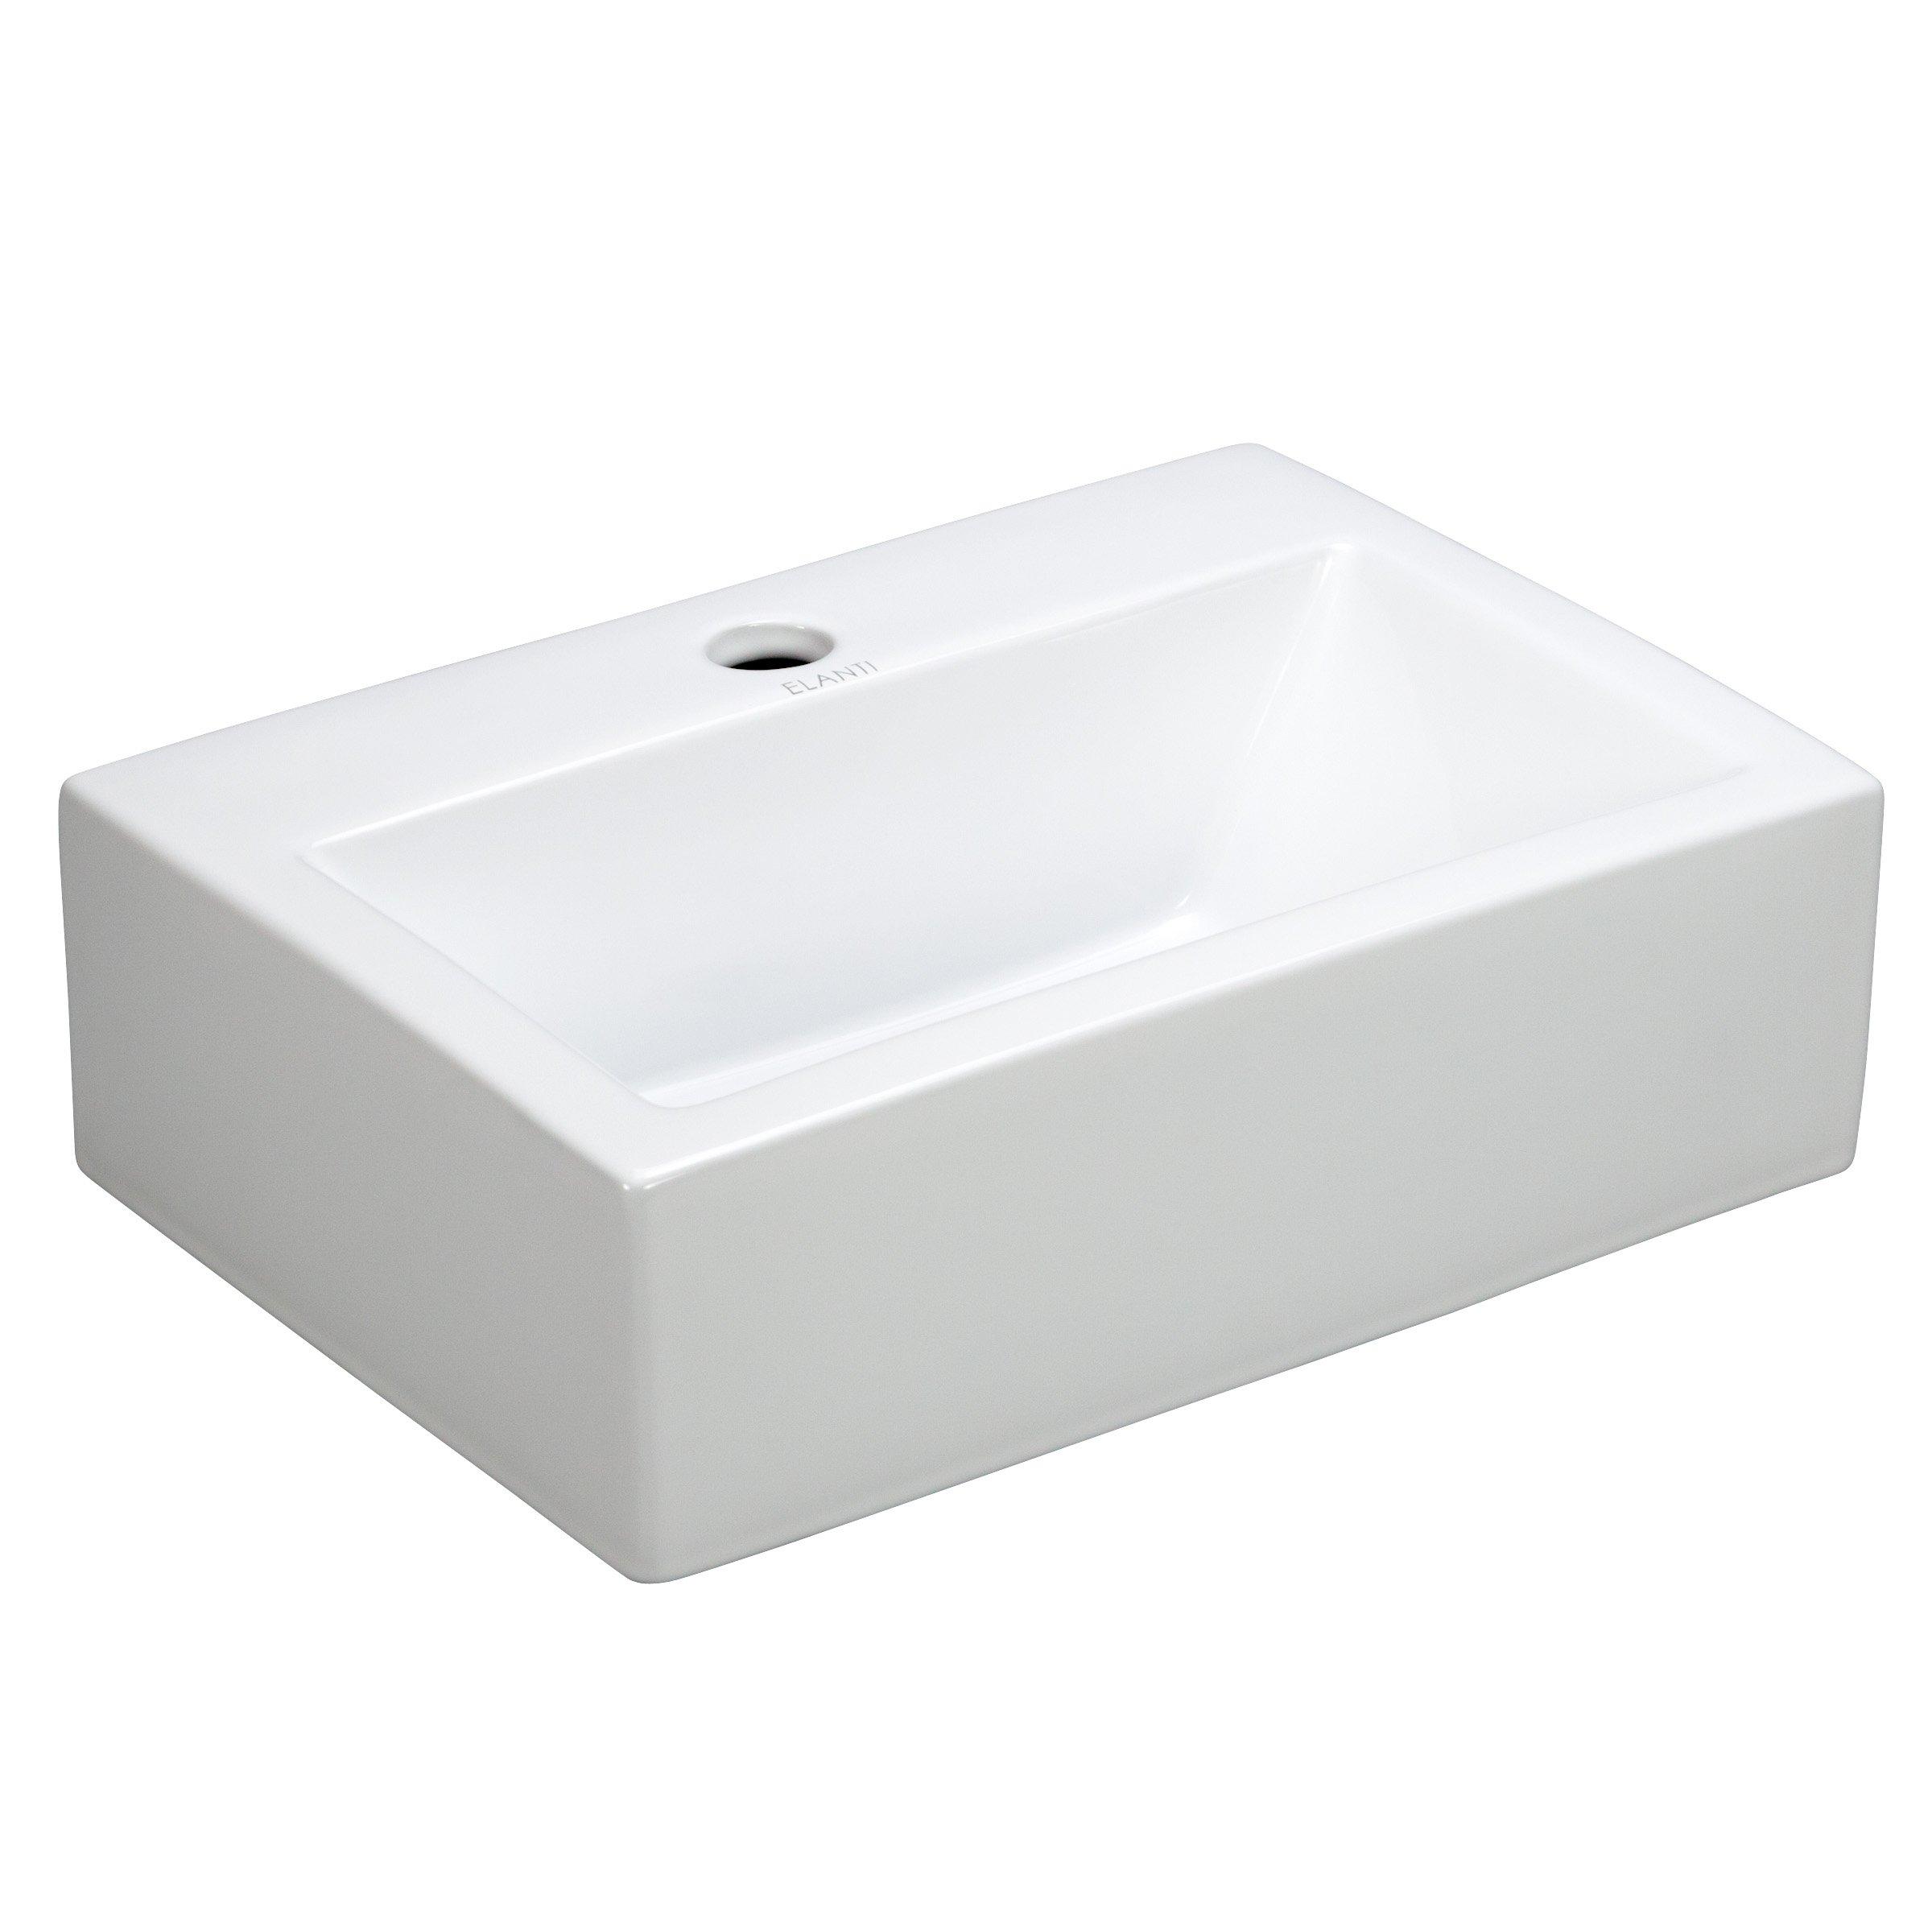 Elite Sinks EC9859 Porcelain Wall-Mounted Rectangle Sink, White